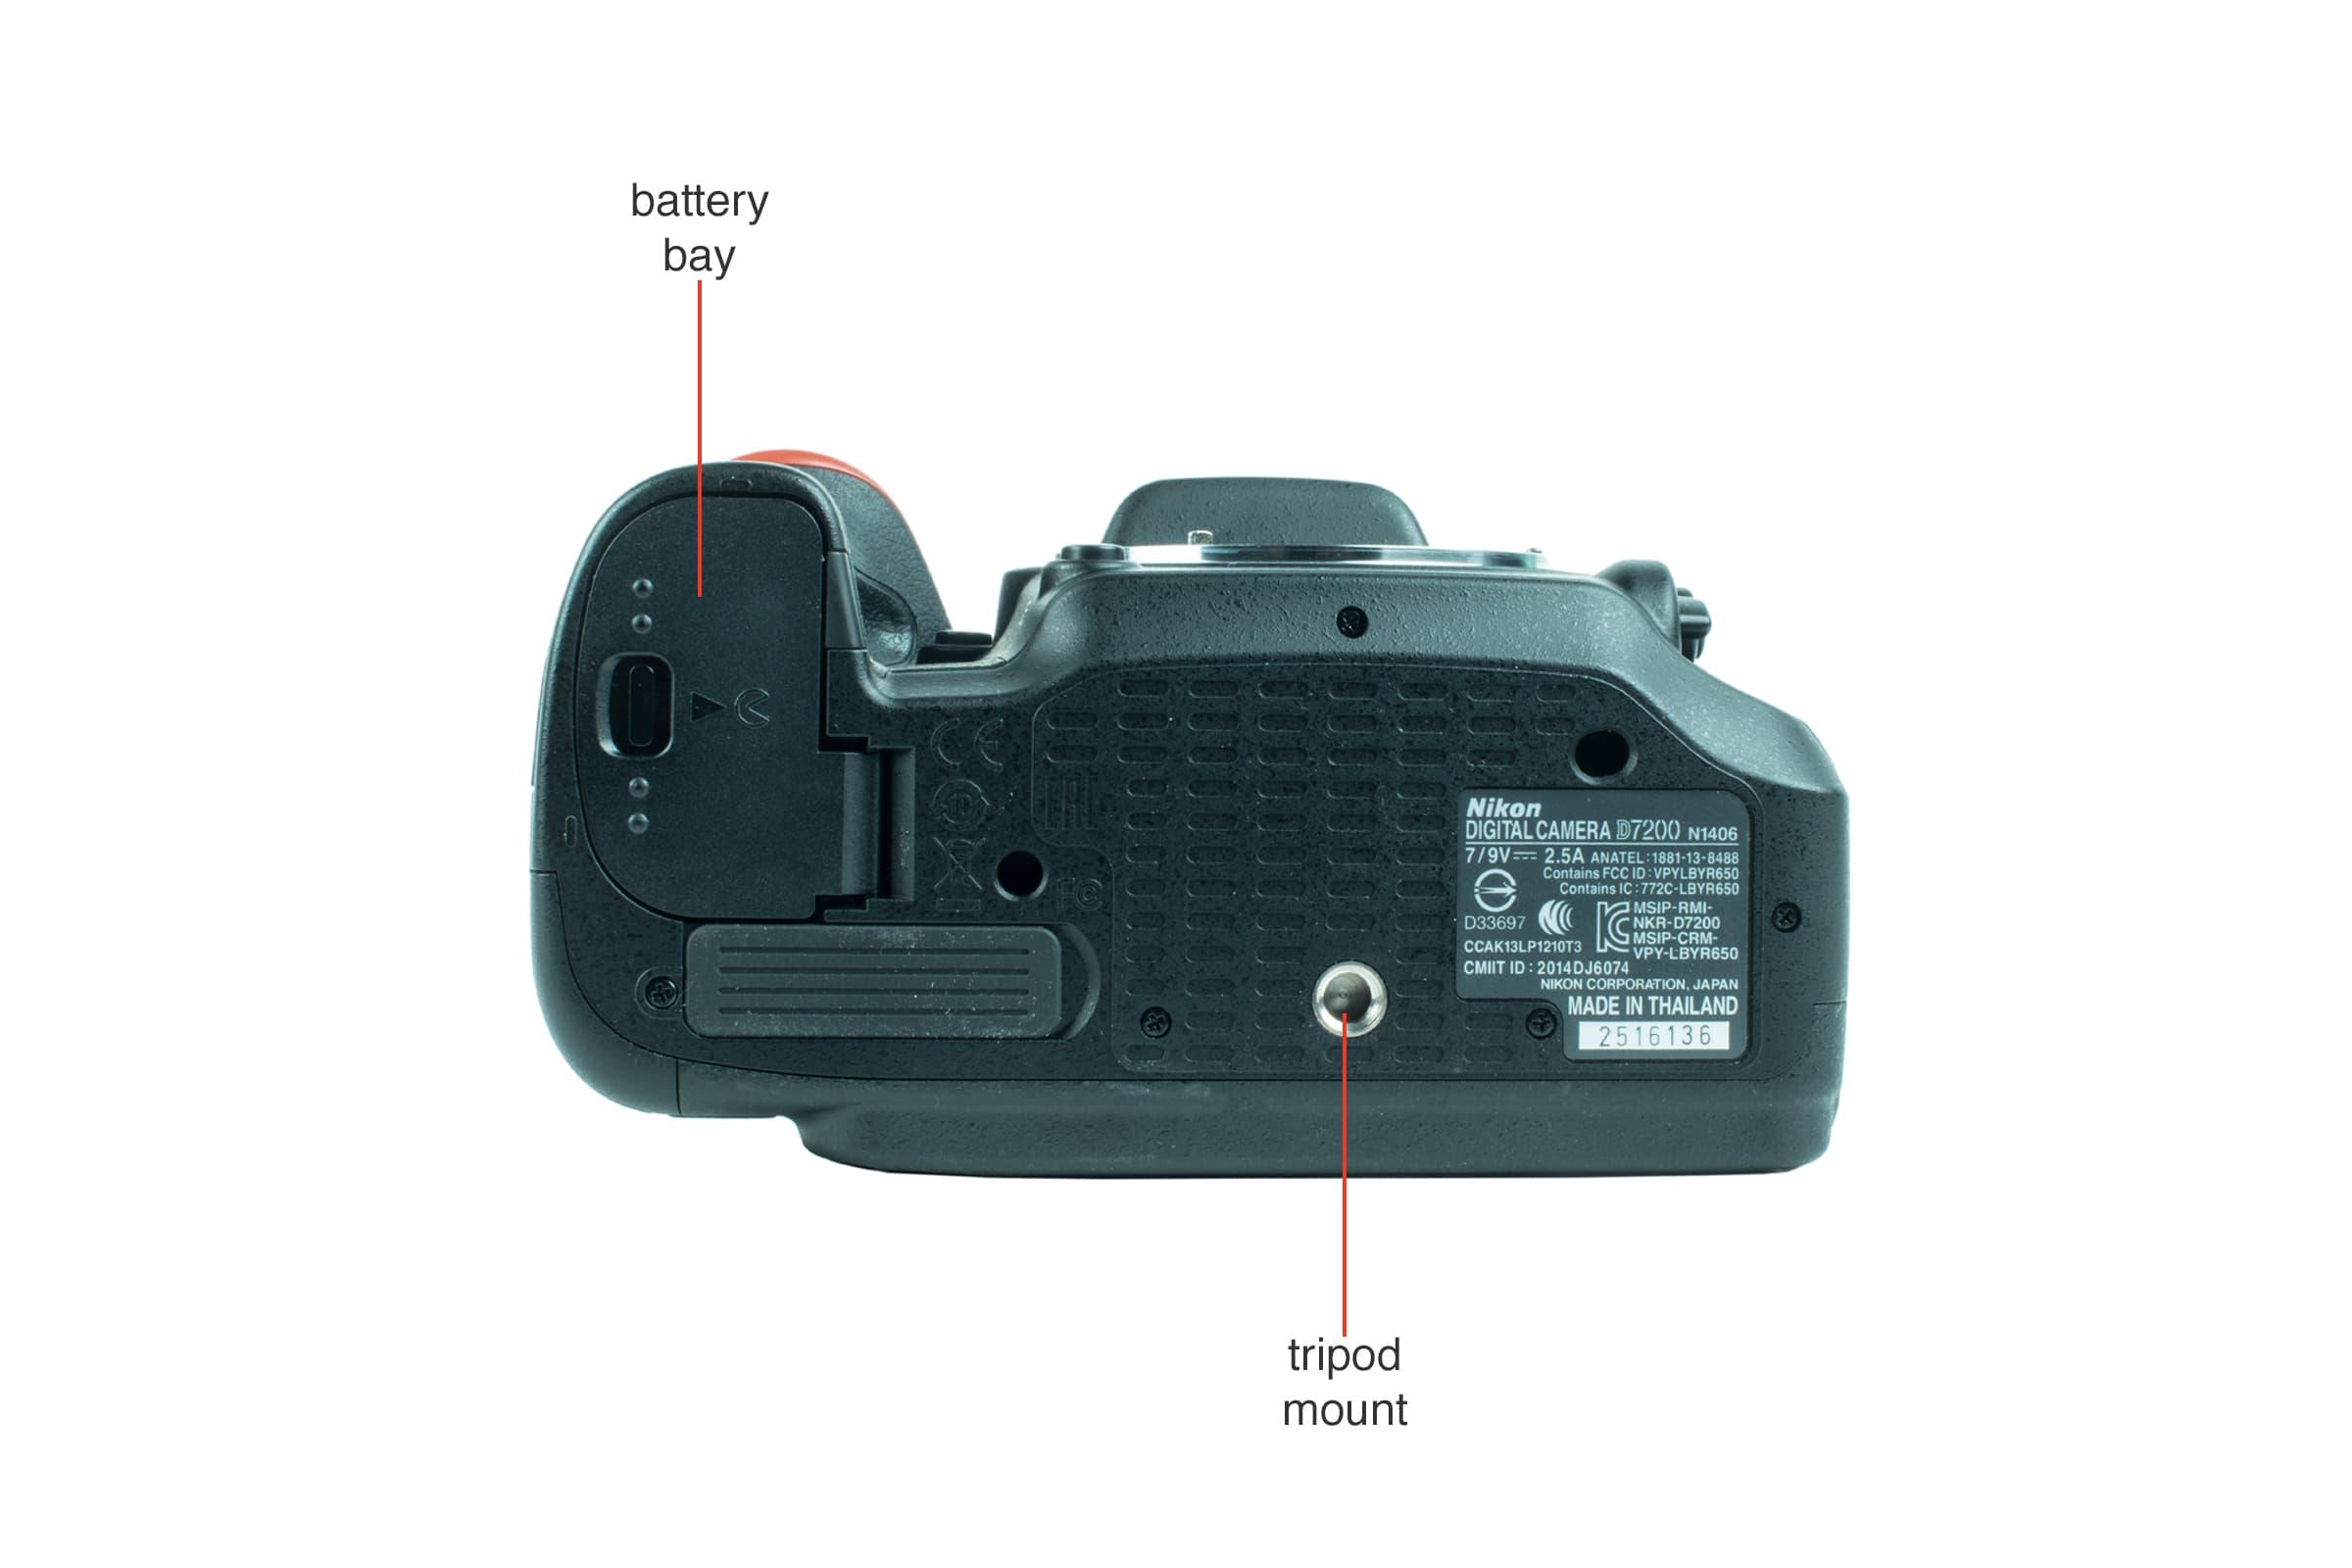 Bottom view of the Nikon D7200.